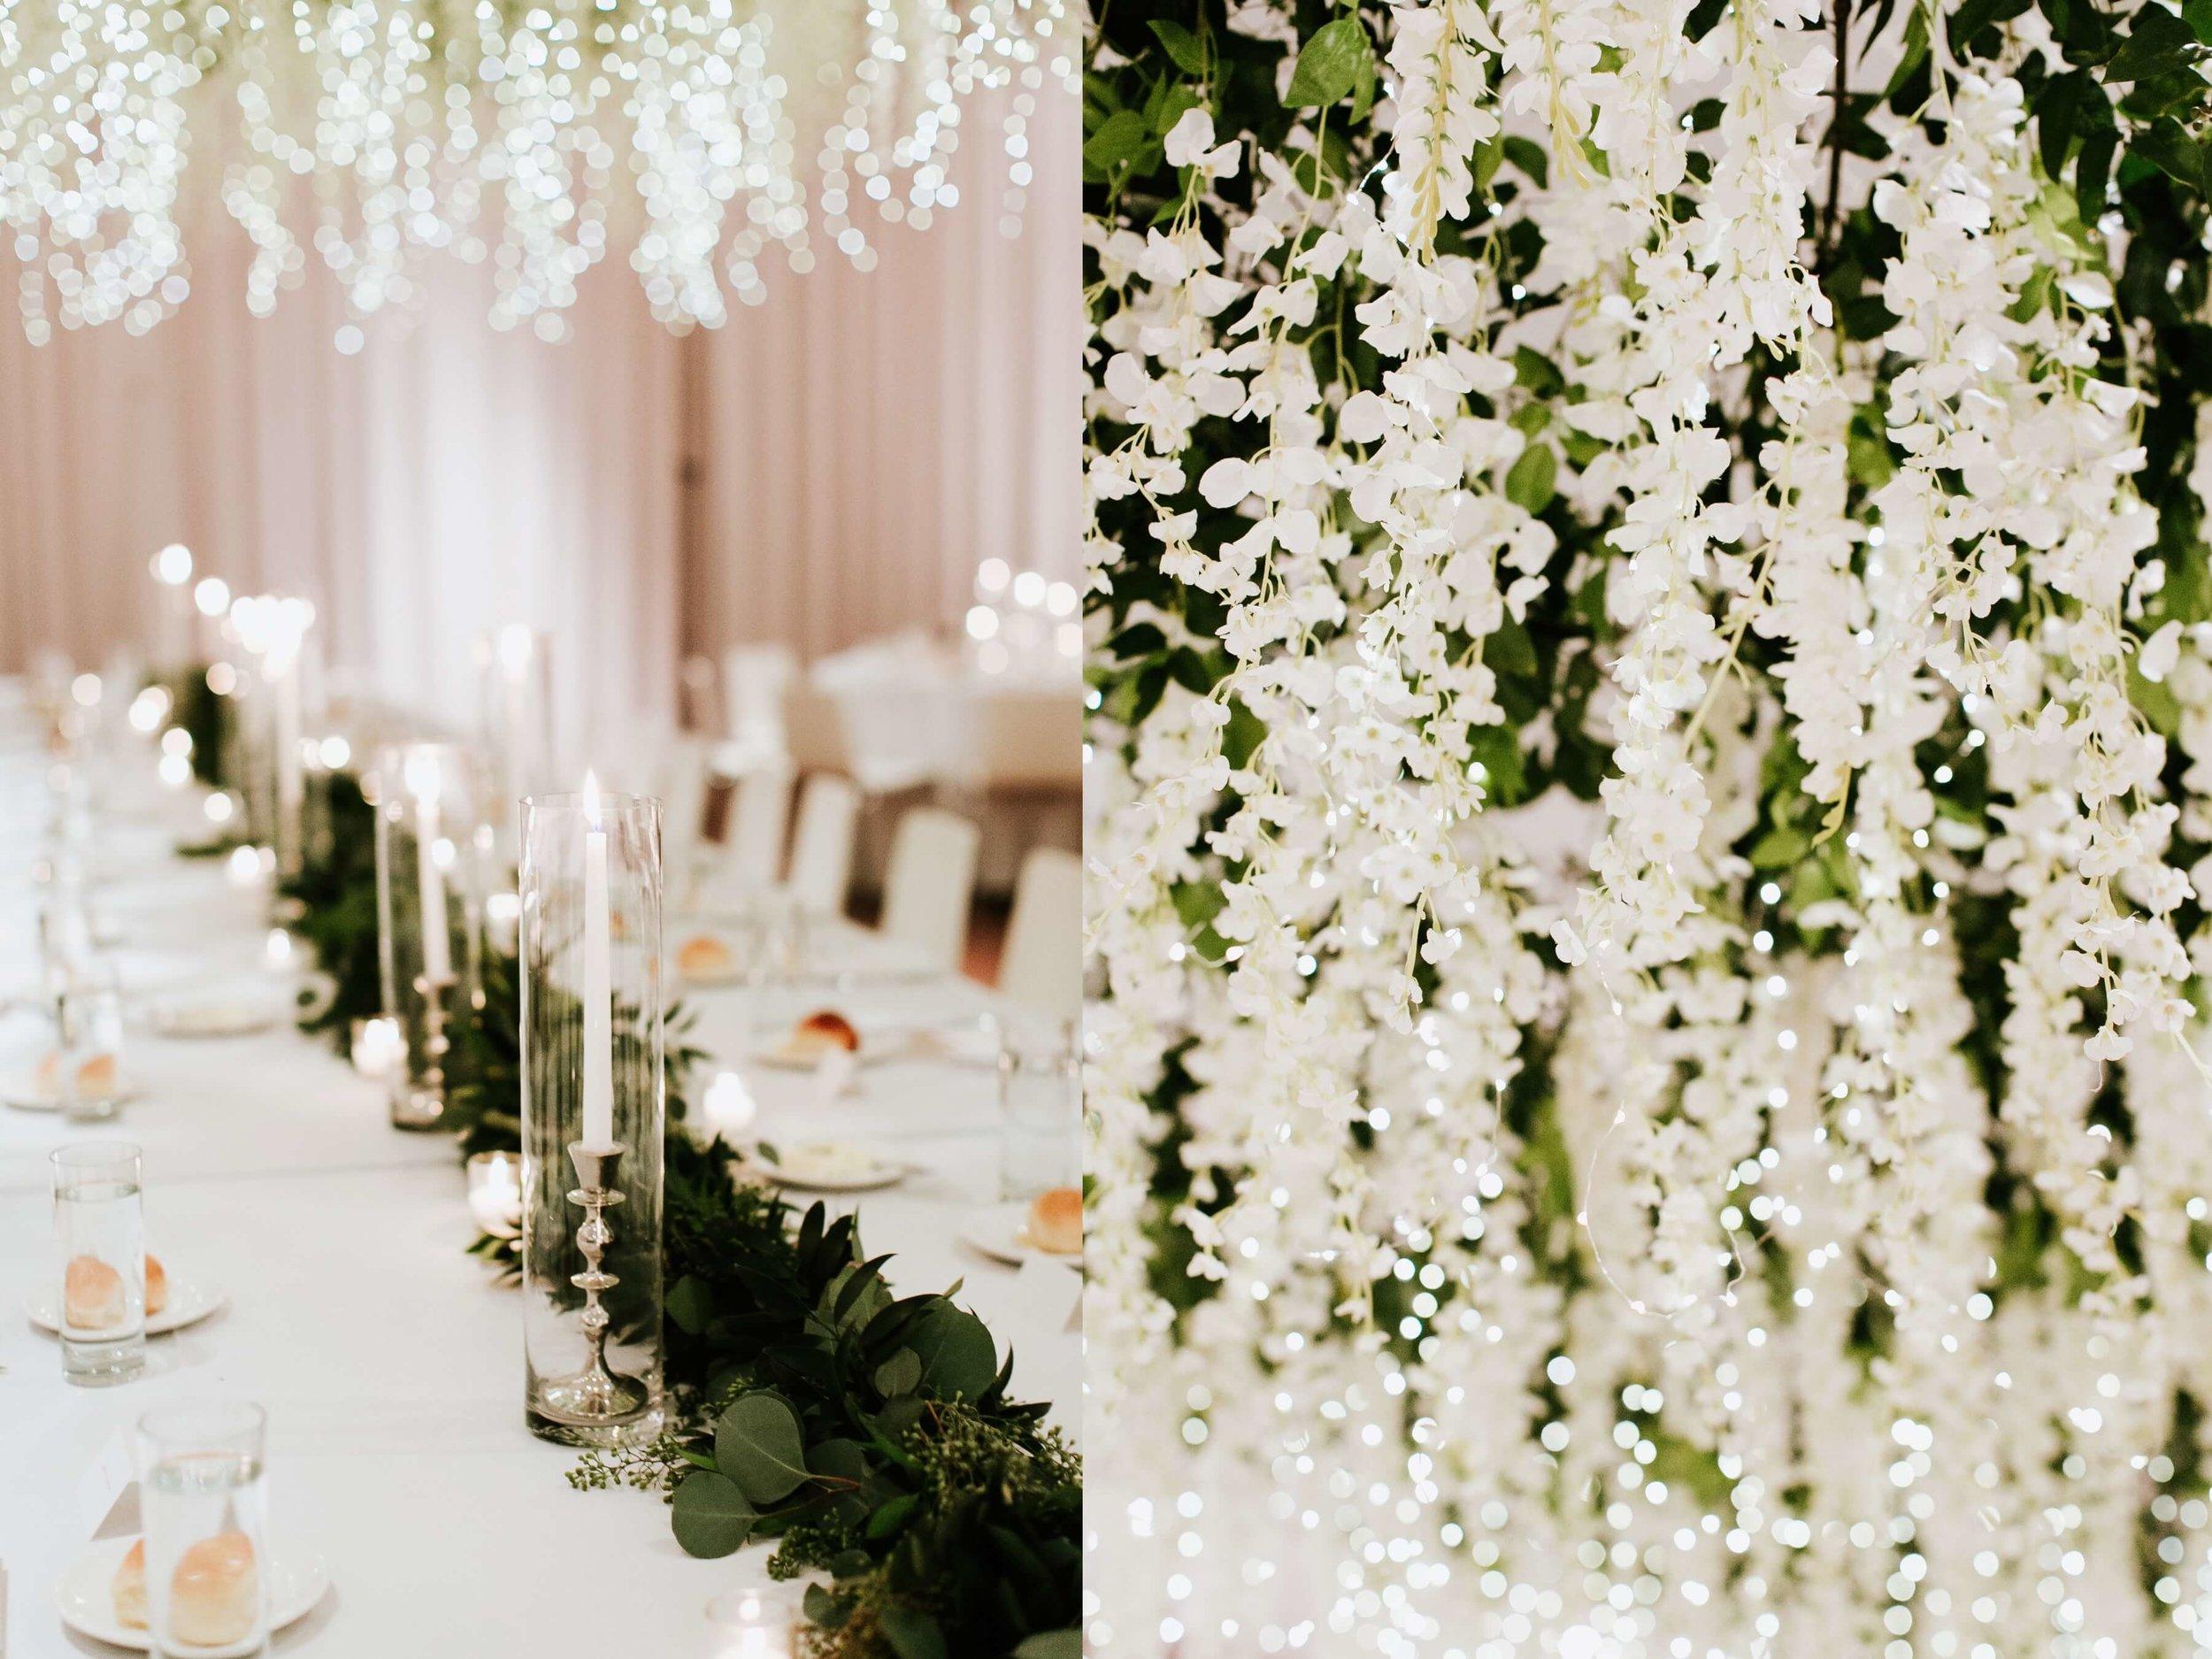 McGough Wedding594 copy.jpg